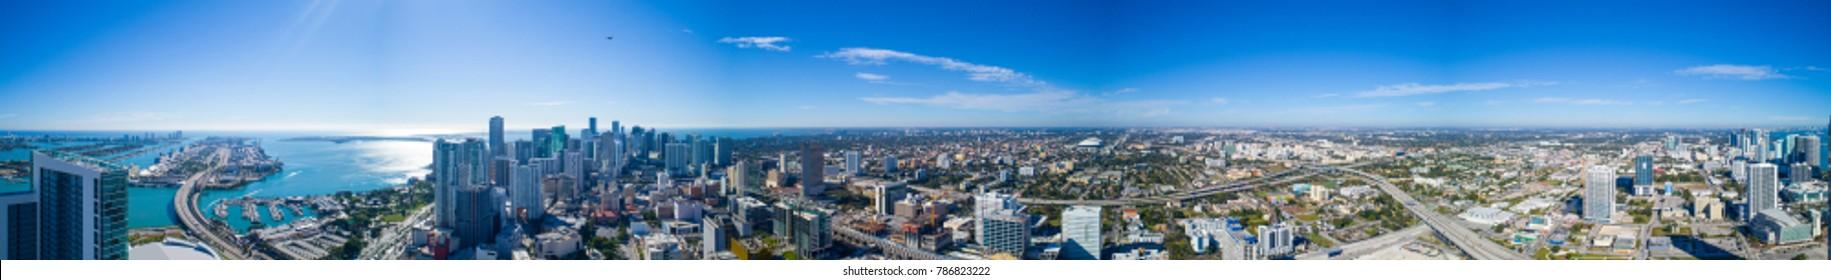 Aerial 360 panoramic image of Downtown Miami FLorida USA